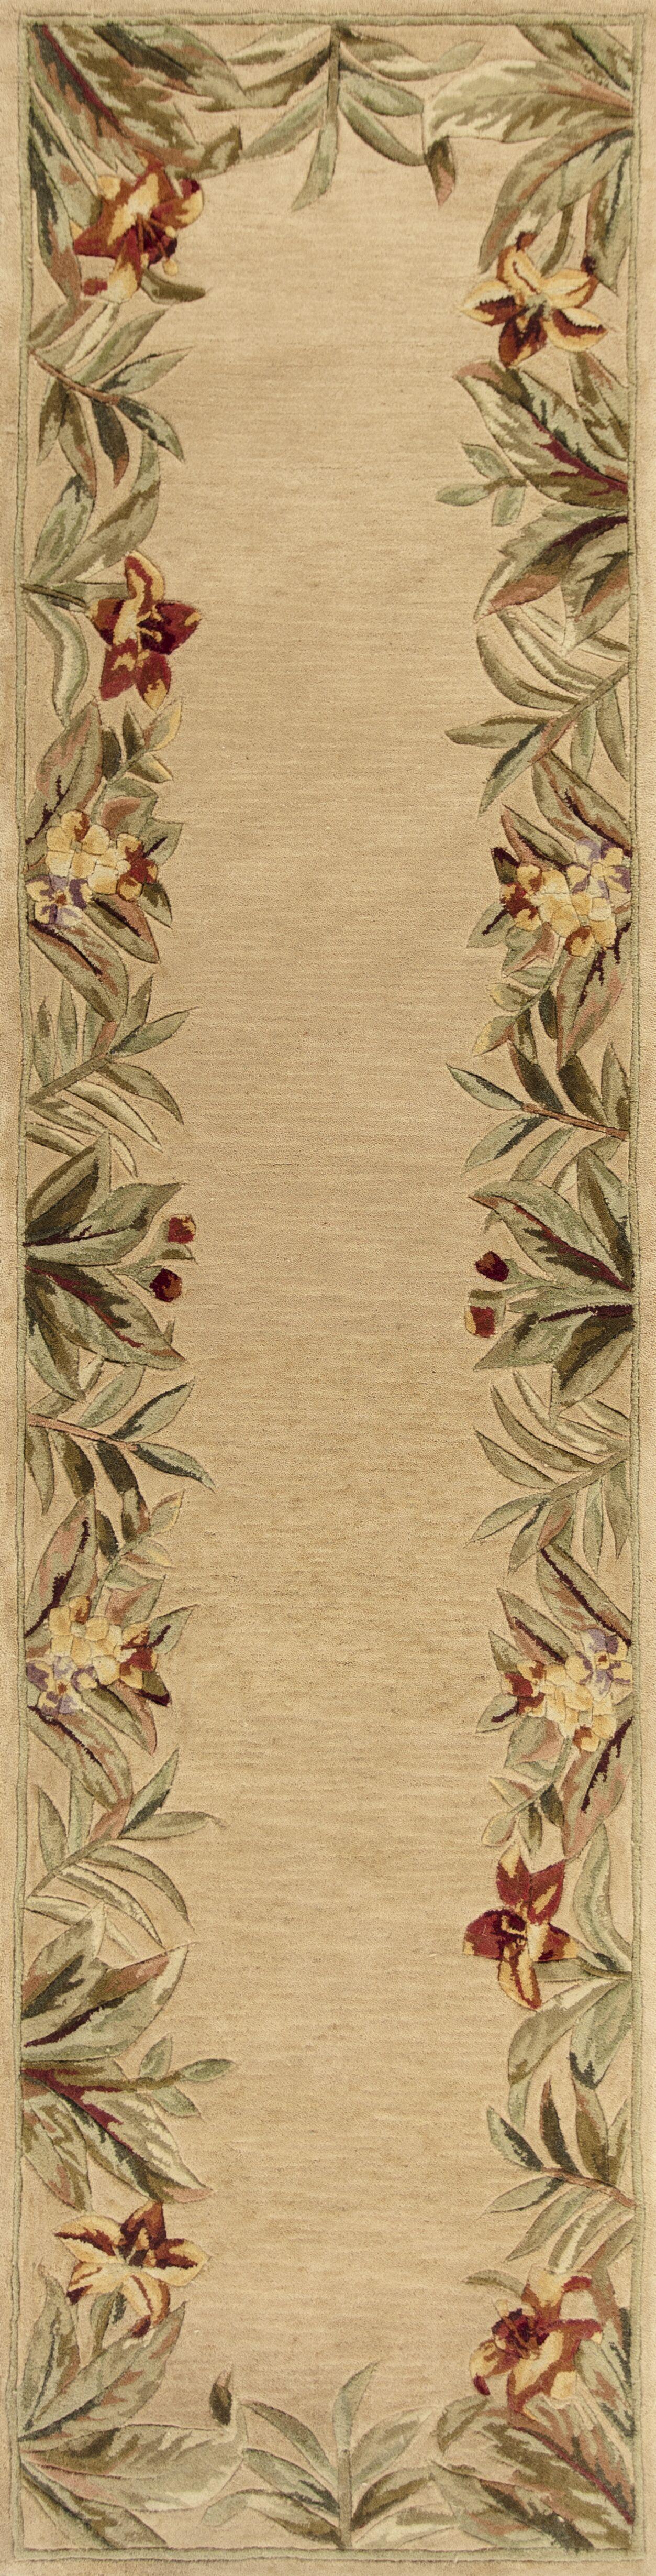 Murray Beige Rainforest Floral Area Rug Rug Size: Rectangle 3'6